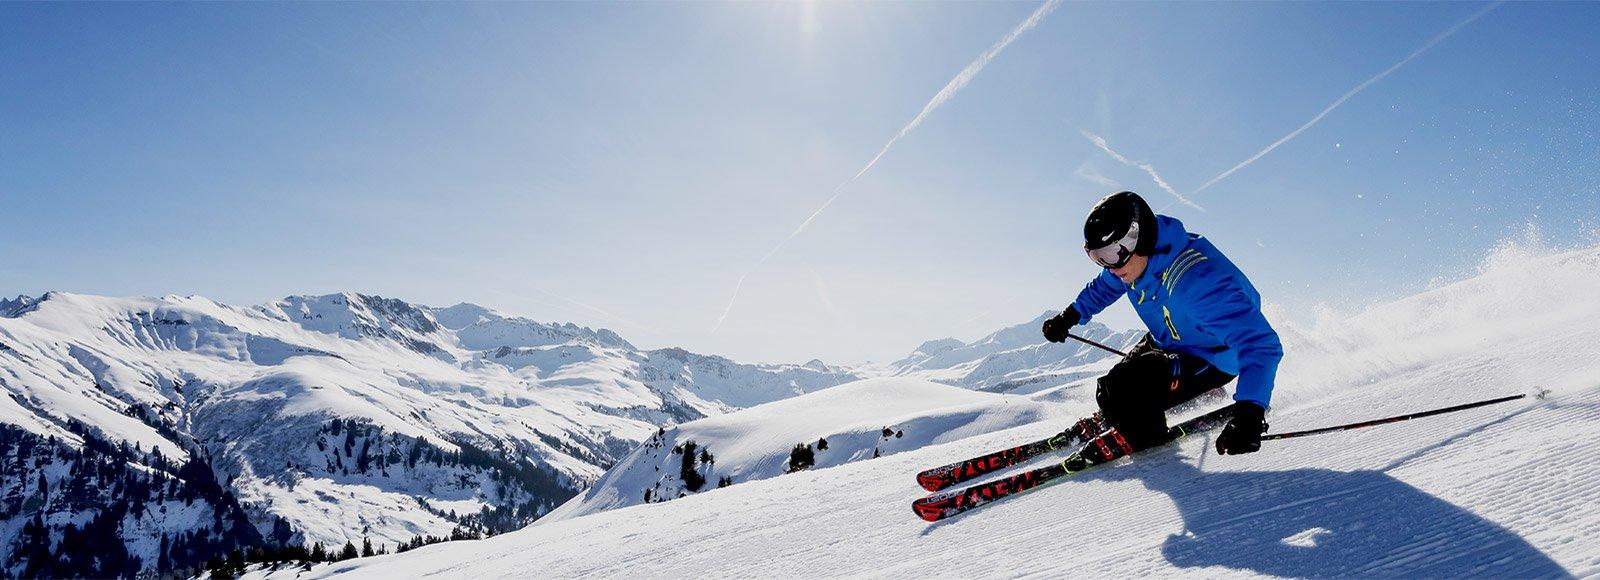 Club Med 187 Skimax Holidays The Ski Amp Snowboard Holidays